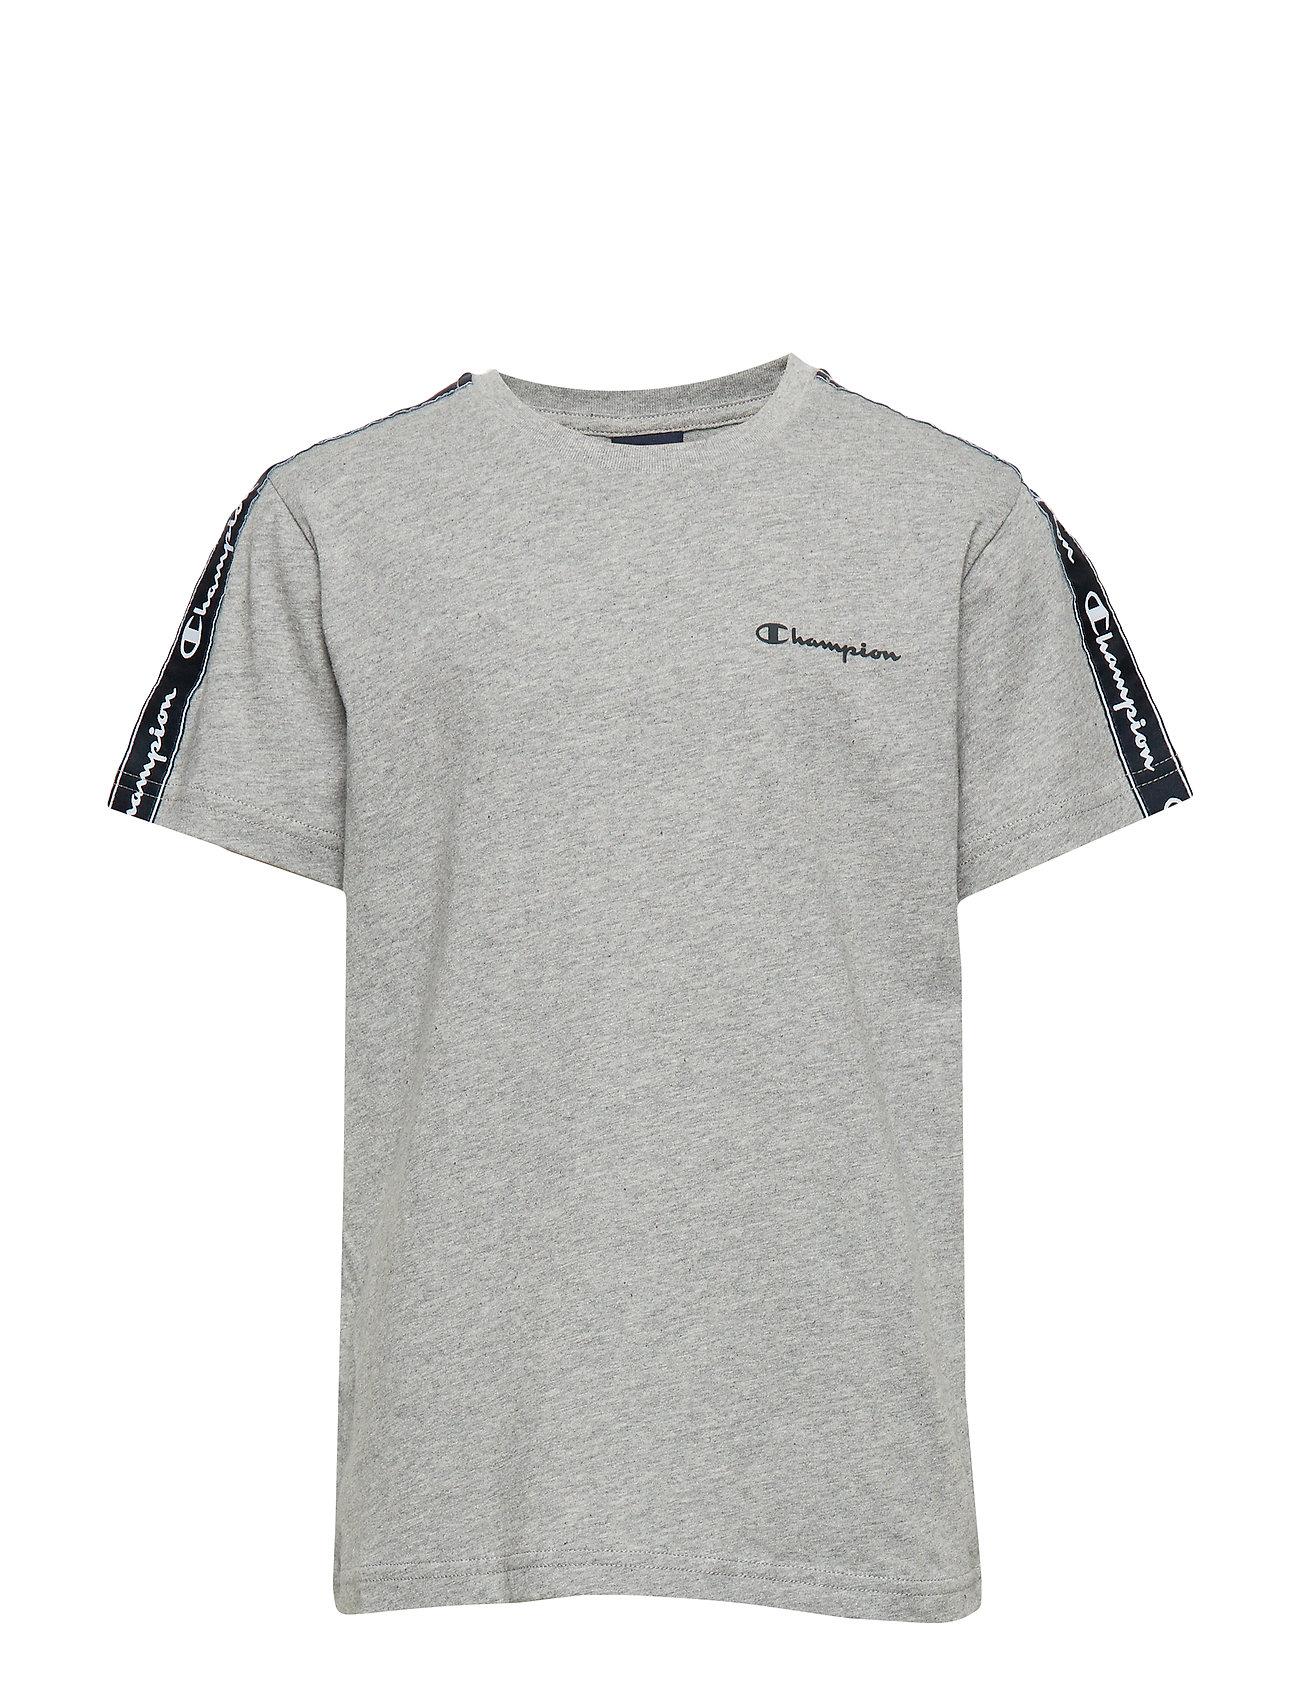 Champion Crewneck T-Shirt - GRAY MELANGE LIGHT